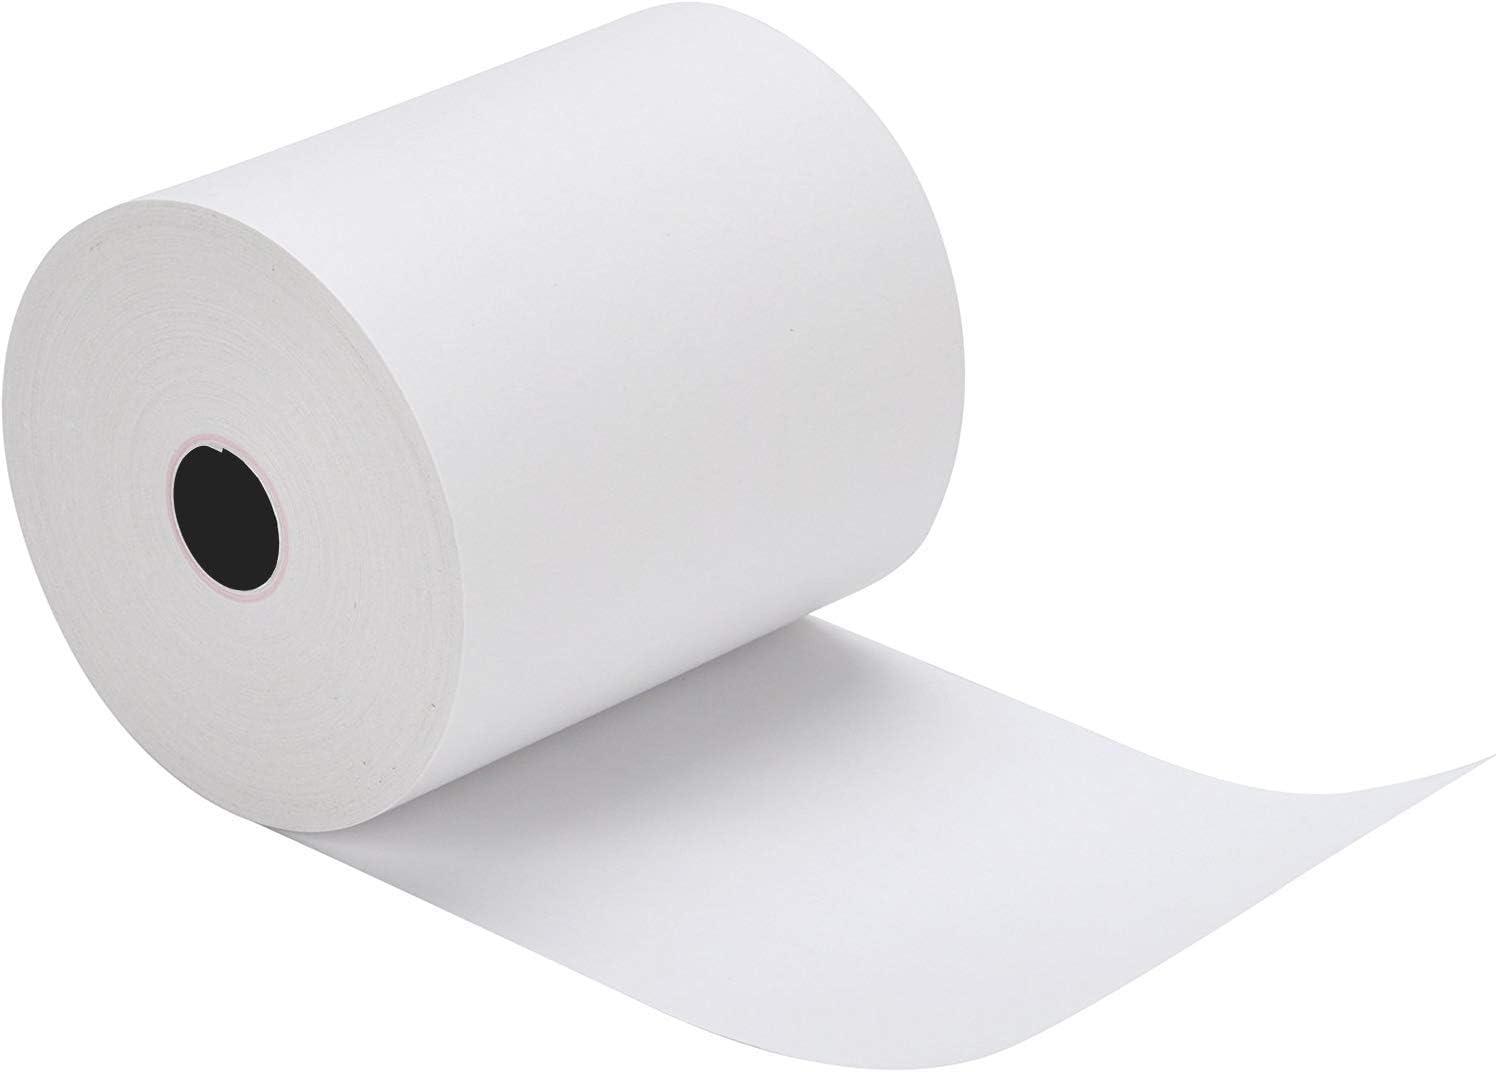 50 Rolls PAPRMA 2 1//4 x 50 Receipt Paper Rolls POS Thermal Paper Cash Register Paper Rolls CORELESS